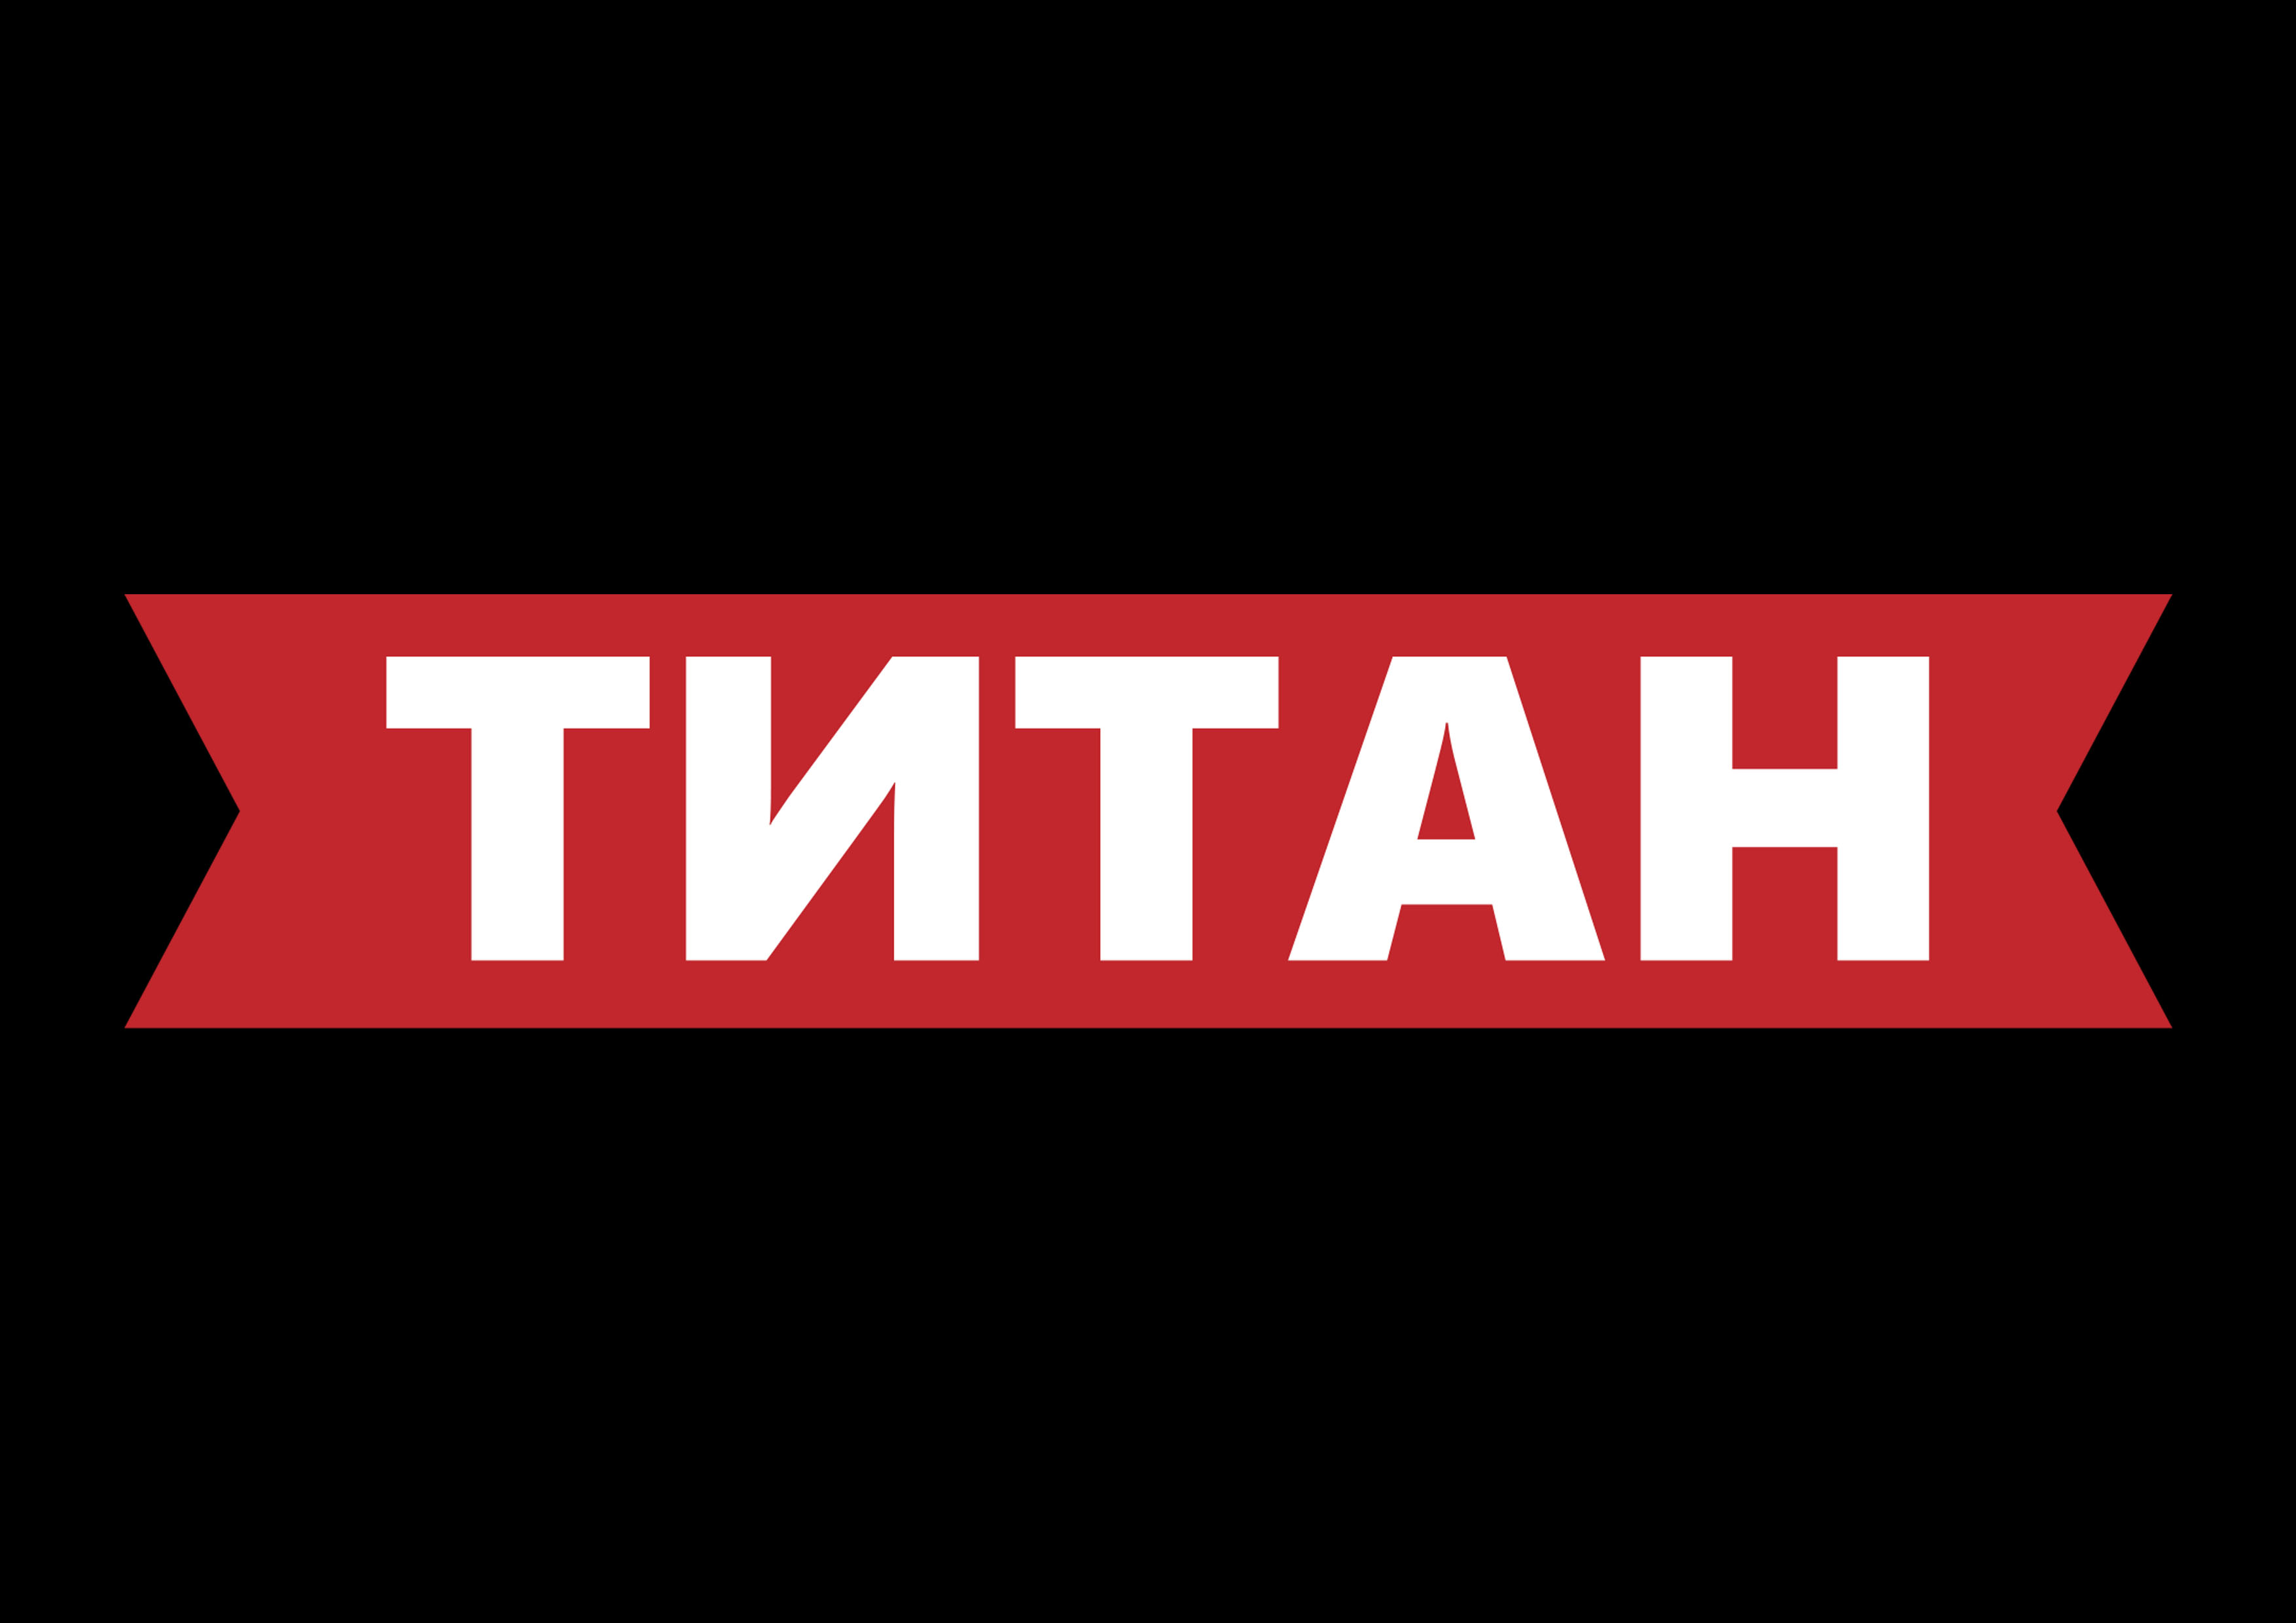 Разработка логотипа (срочно) фото f_4525d4b642078dc6.jpg